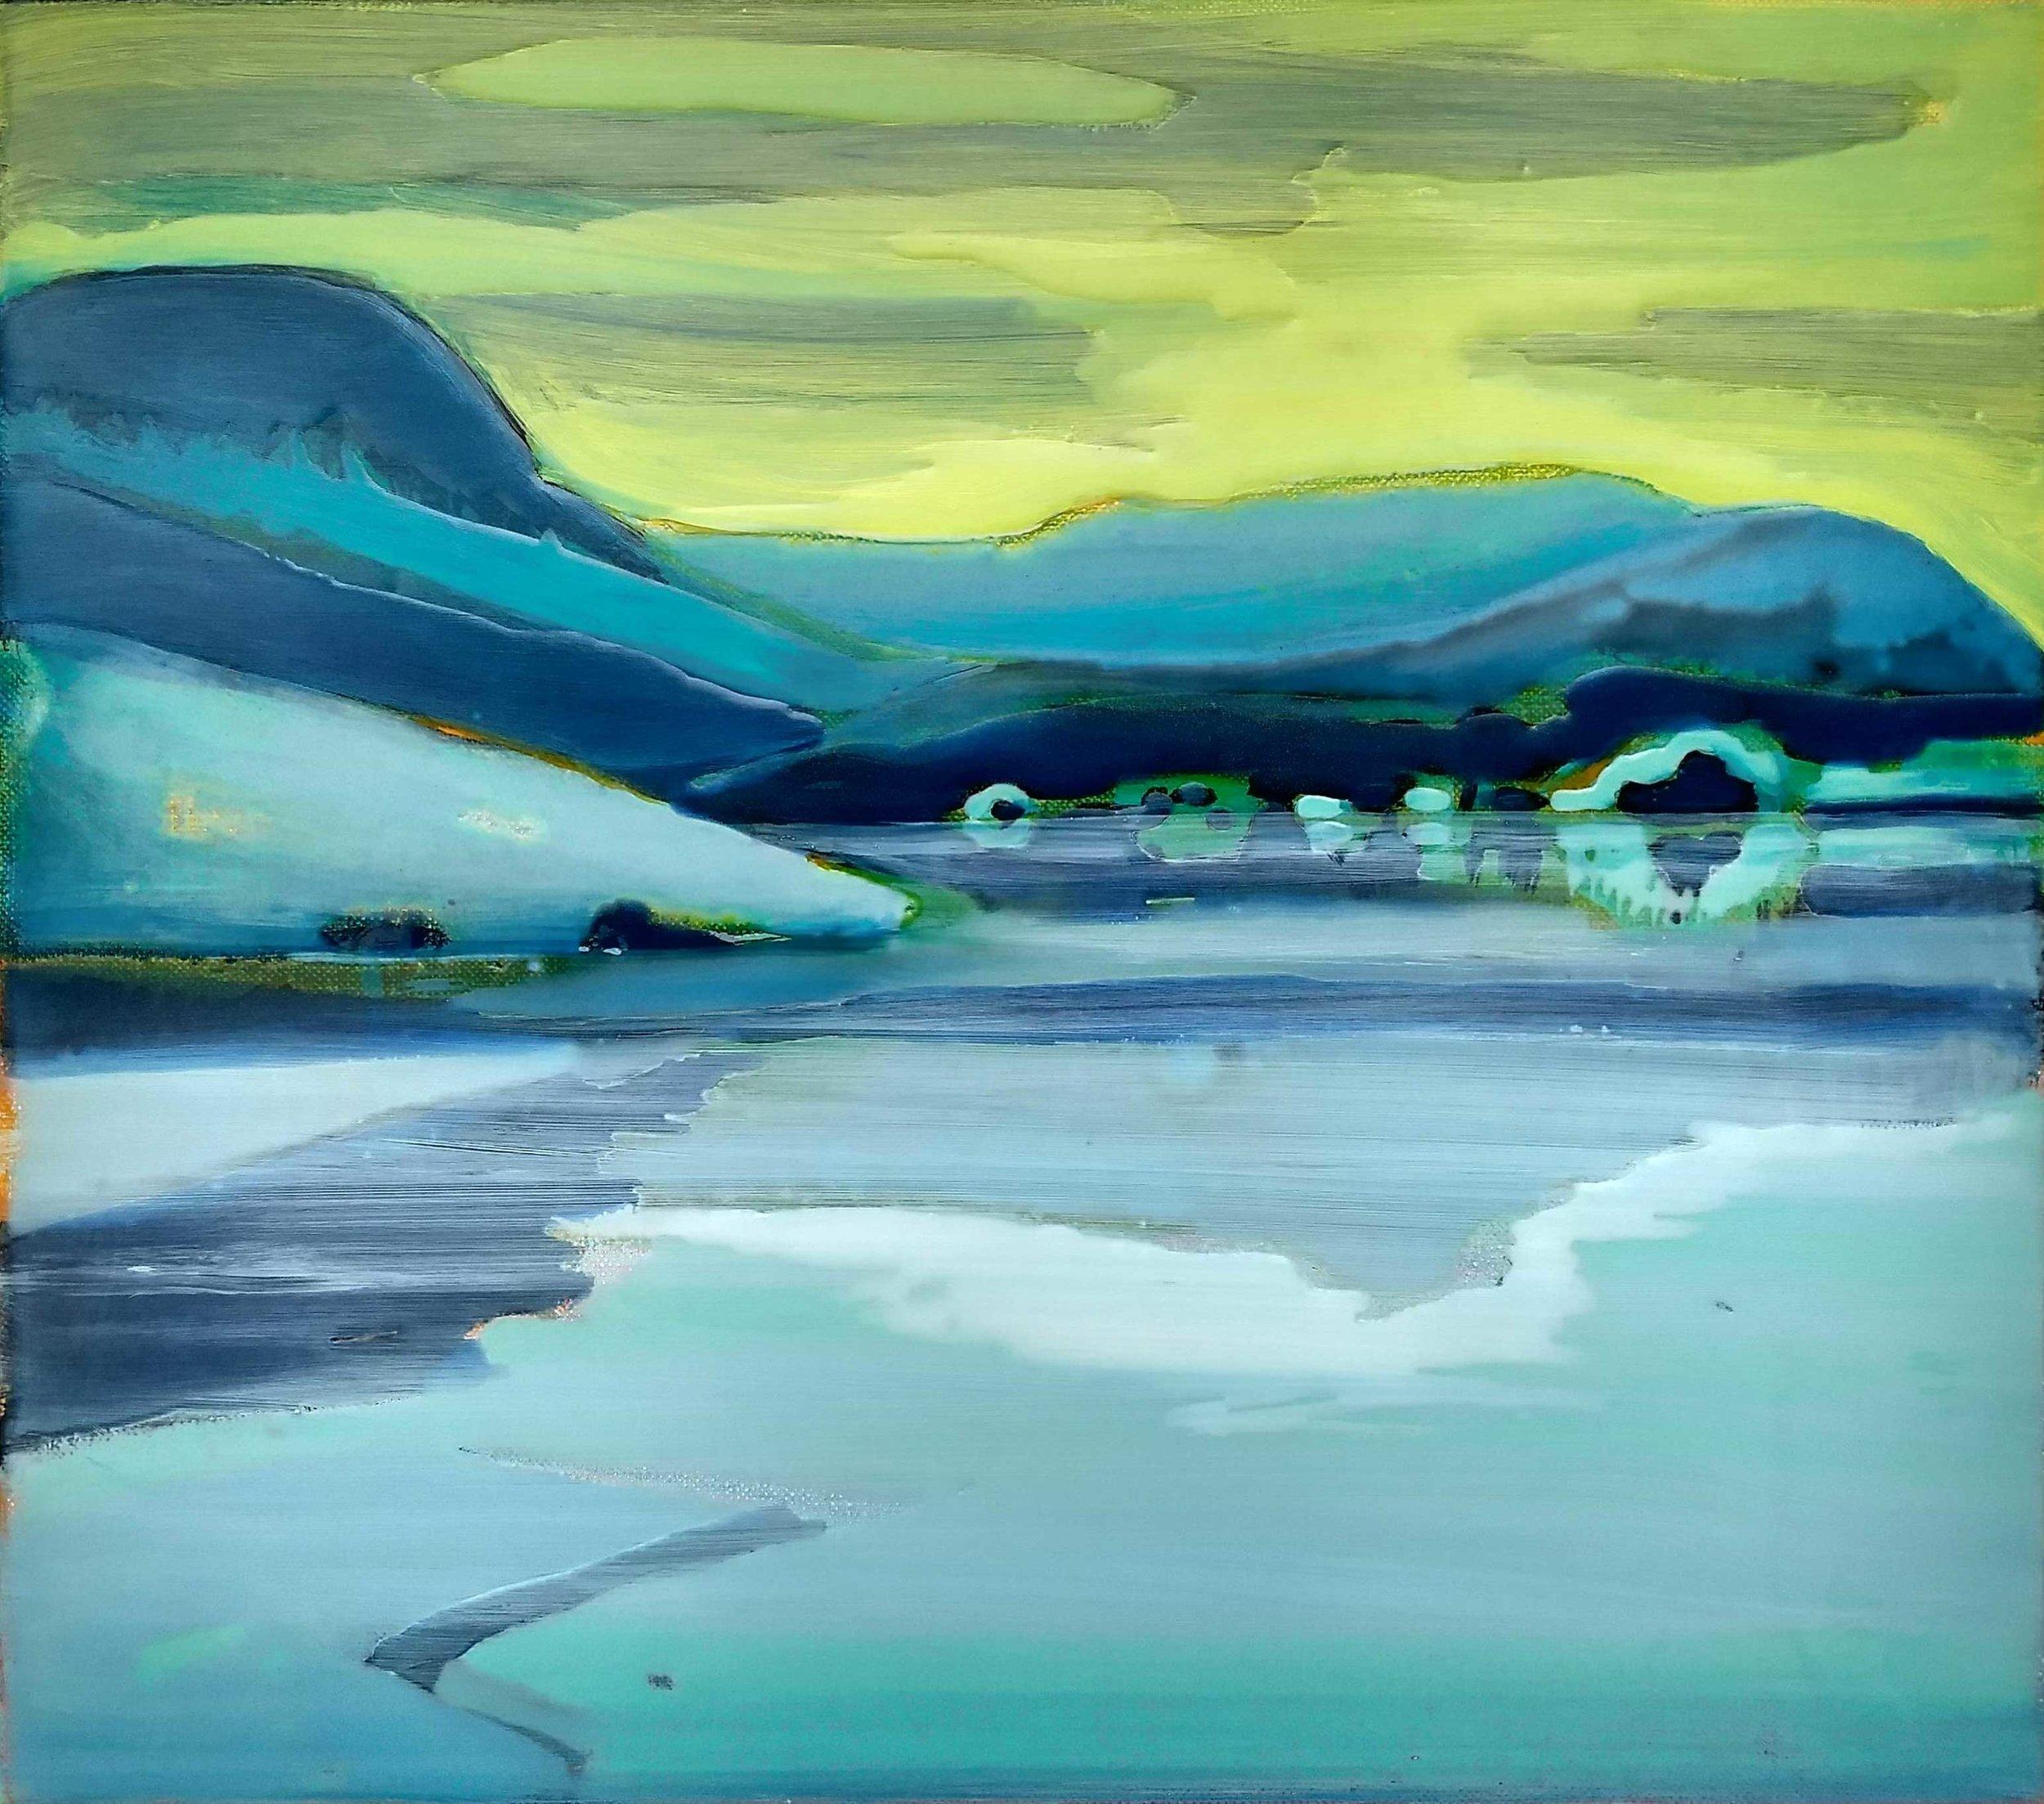 NORWAY-6  40x45 cm acrylic and epoxy on canvas